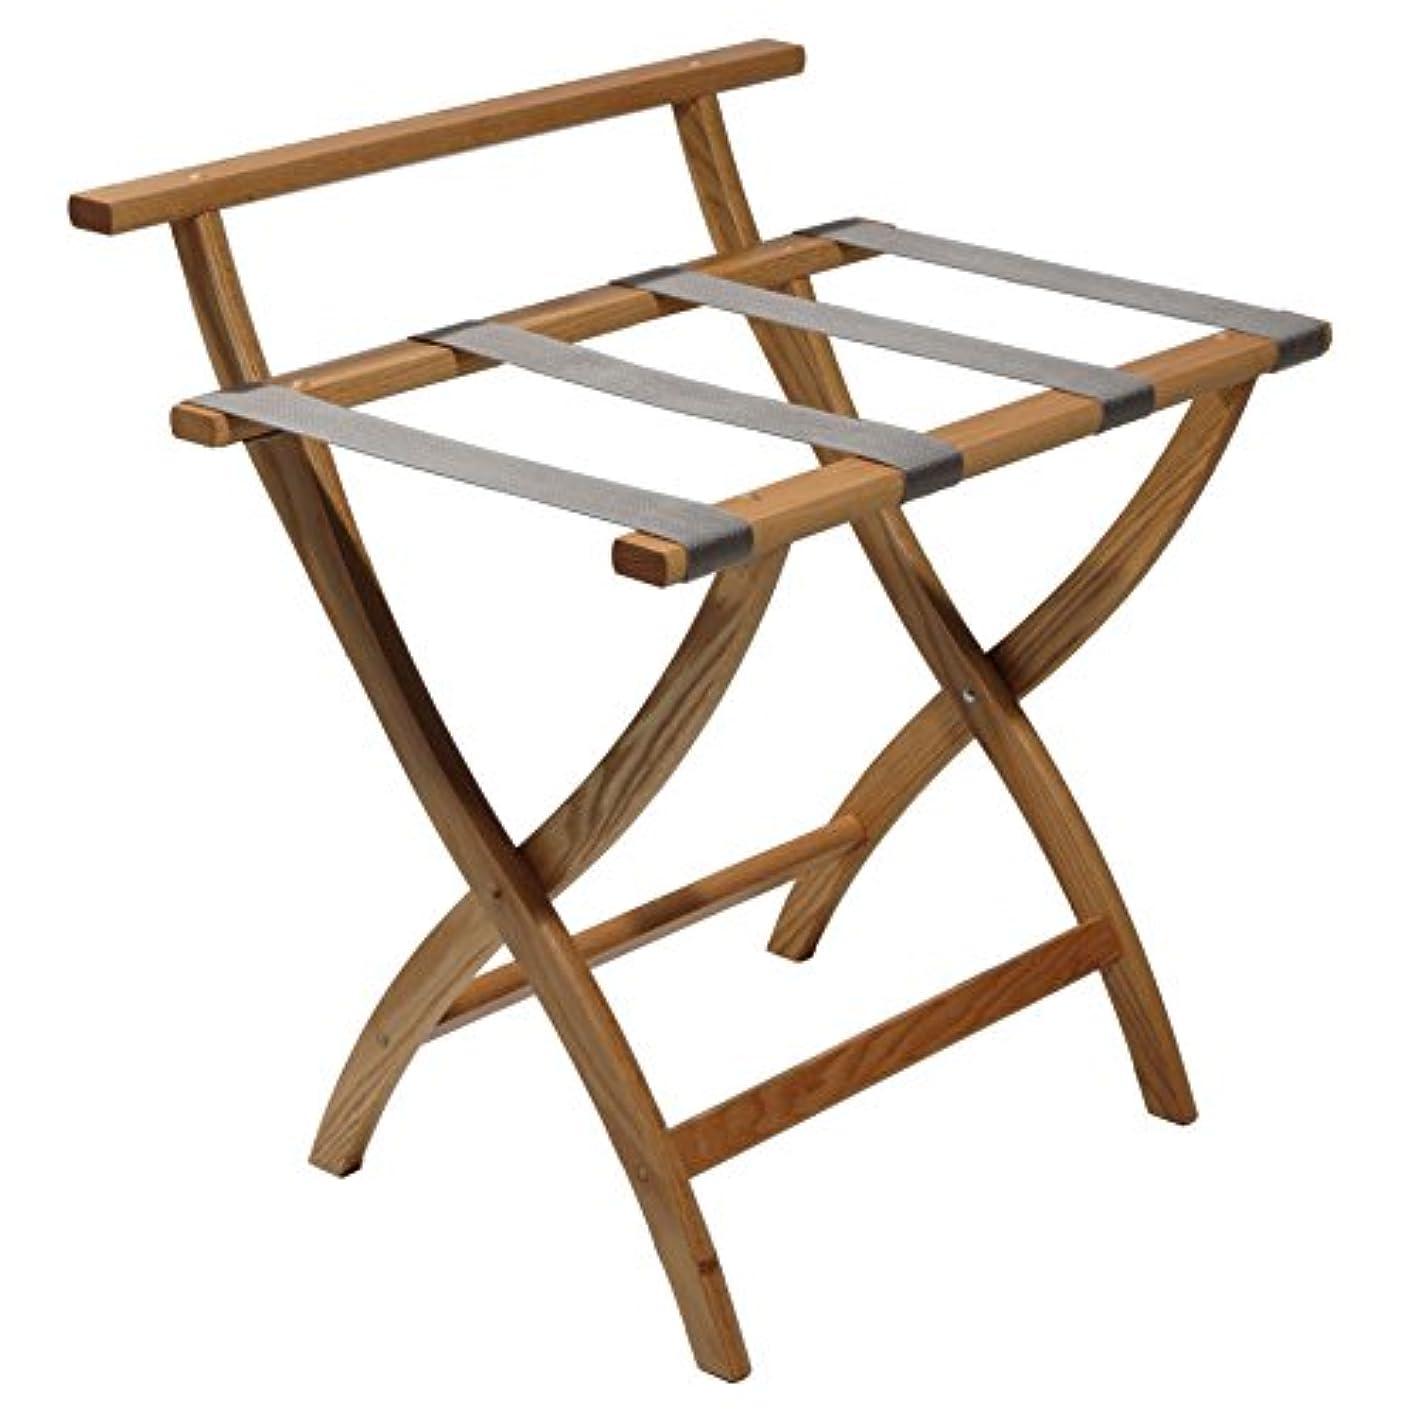 Wooden Mallet Grey Straps, Light Oak WallSaver Luggage Rack,